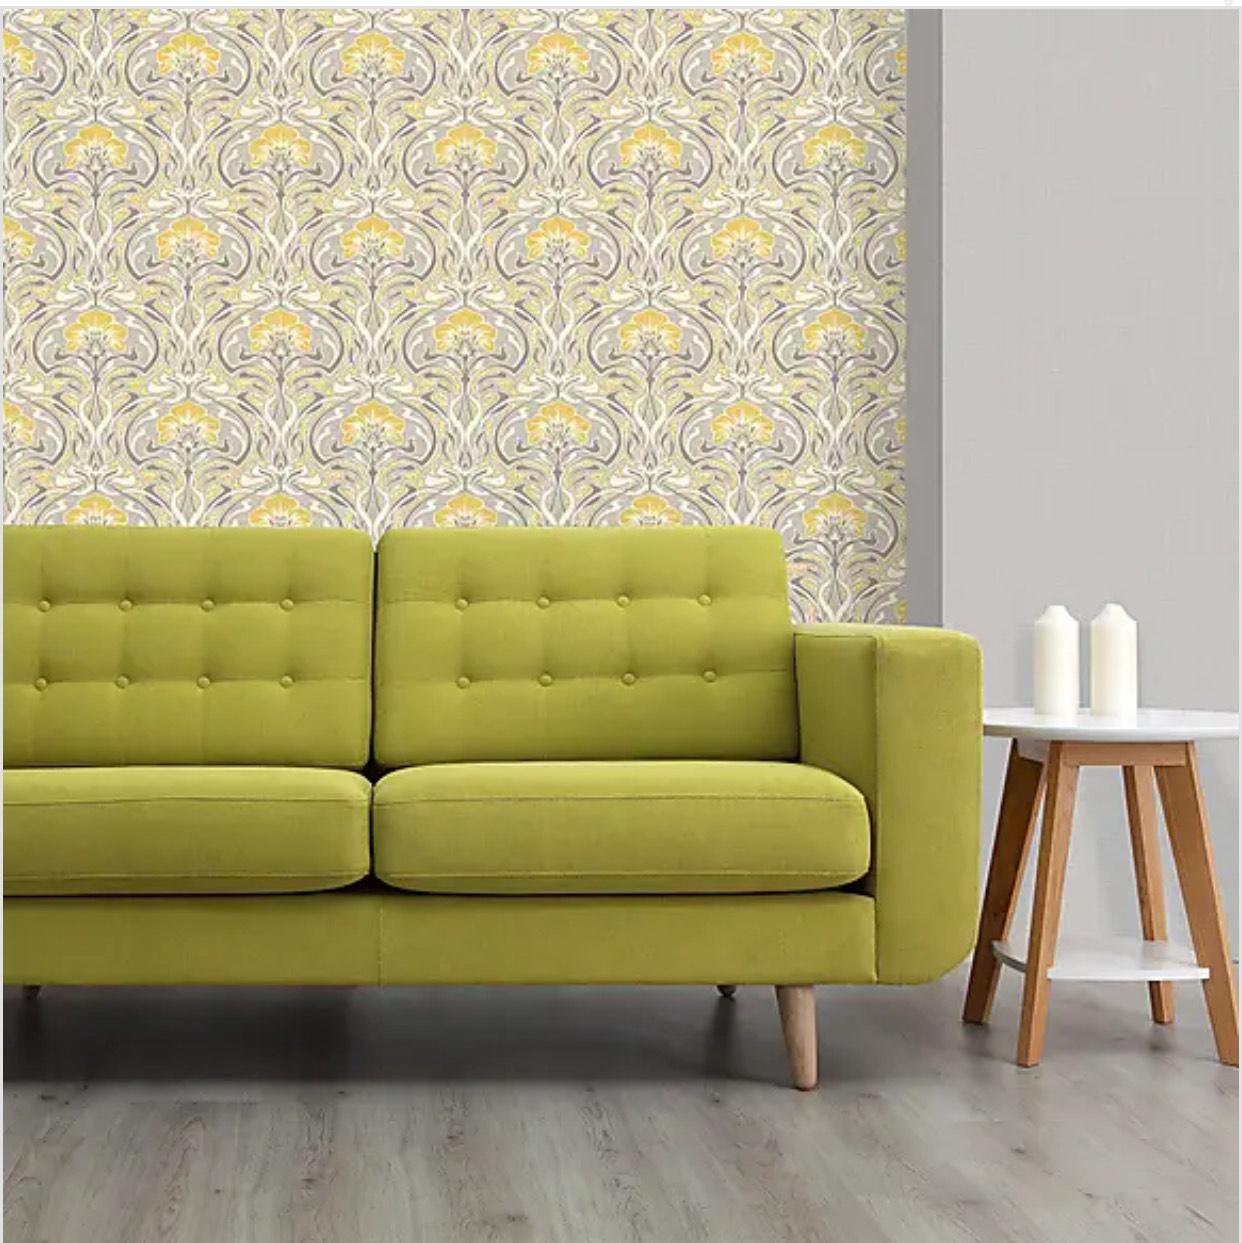 Flora Nouveau Yellow Wallpaper - £6 (Free Click & Collect / Limited Stores) @ Dunelm